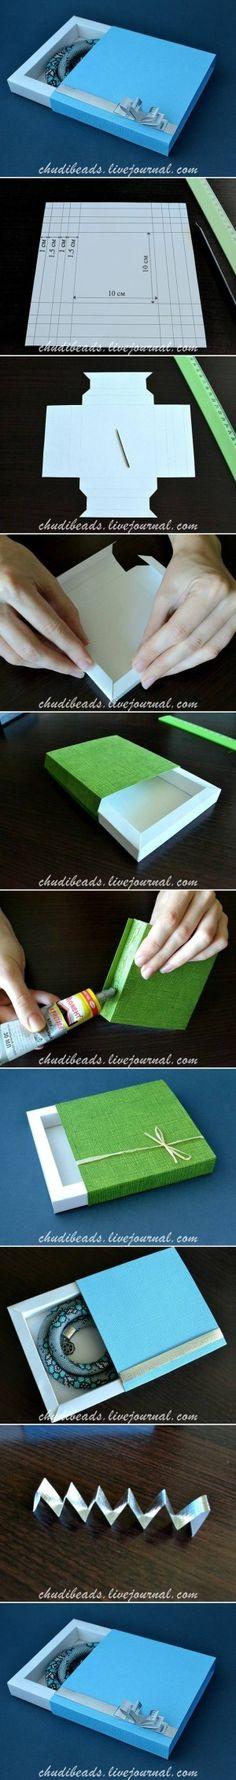 DIY Square Gift Box DIY Square Gift Box by diyforever